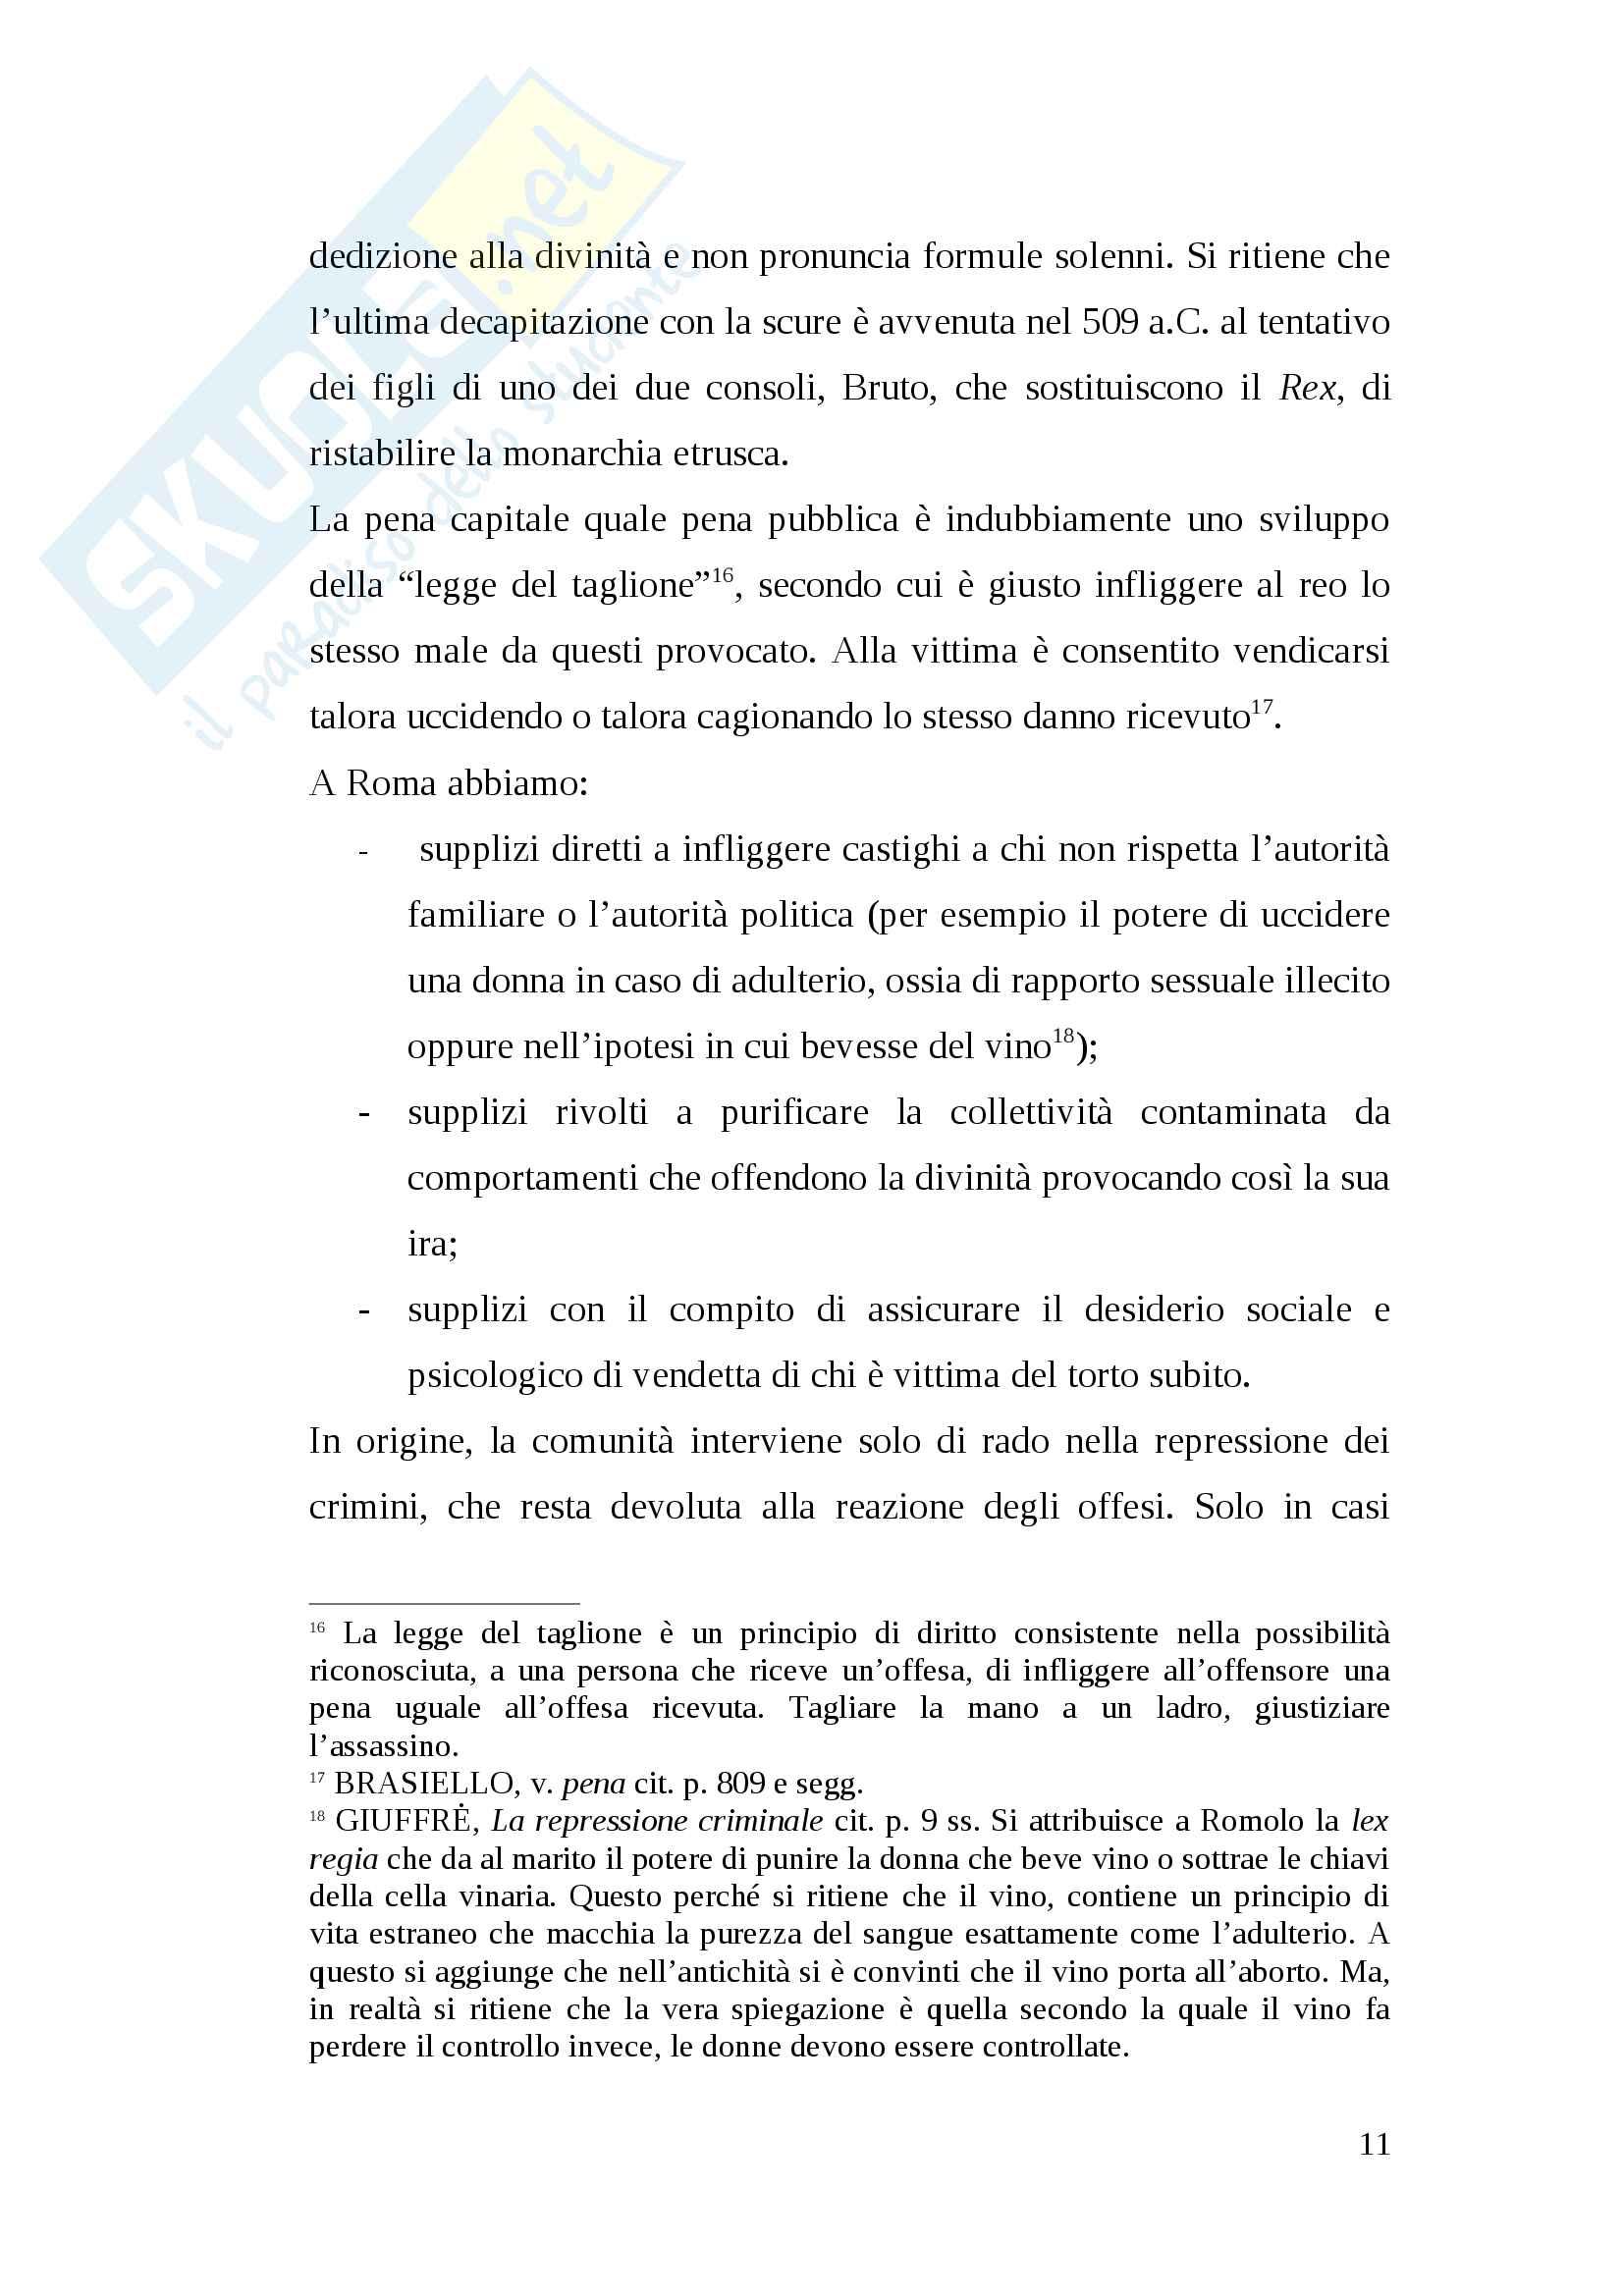 Tesi pena di morte antica Roma Pag. 11